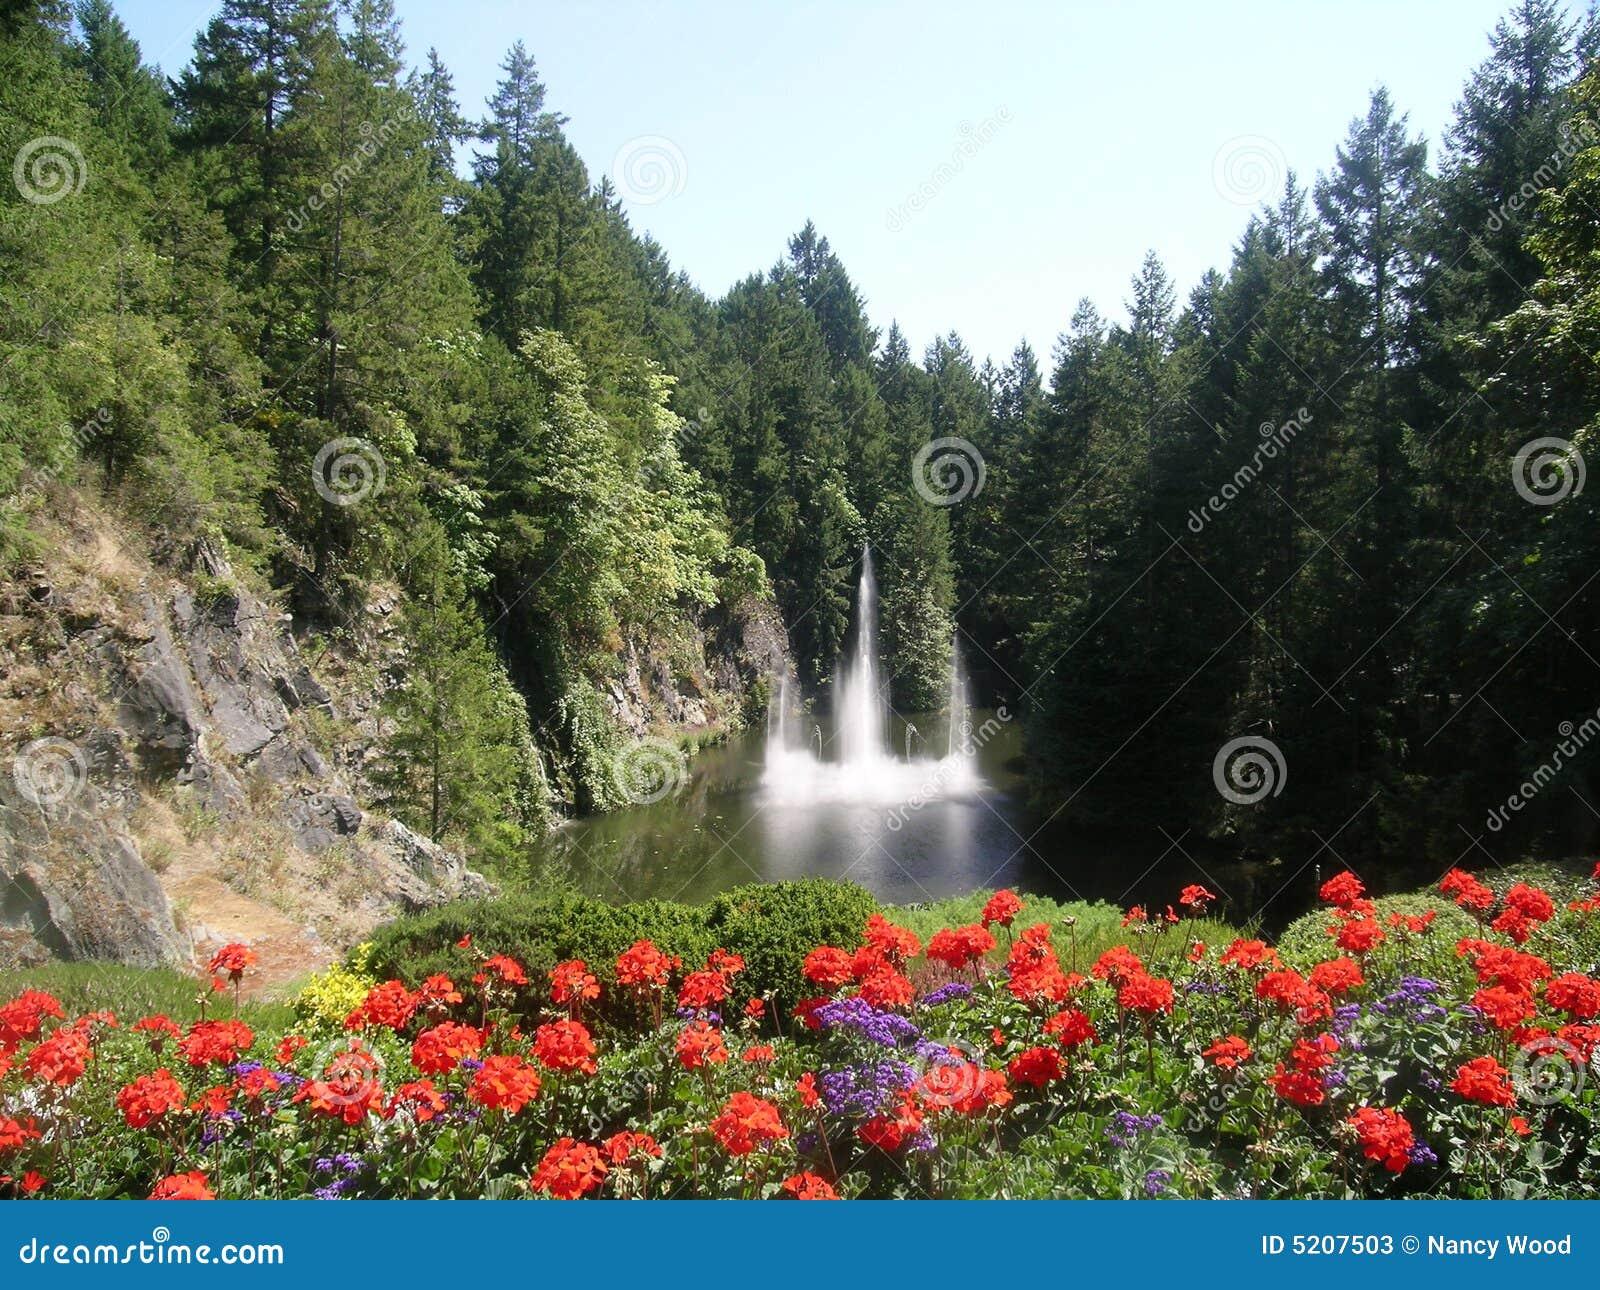 bouchard gardens stock image  image of victoria  waterfalls